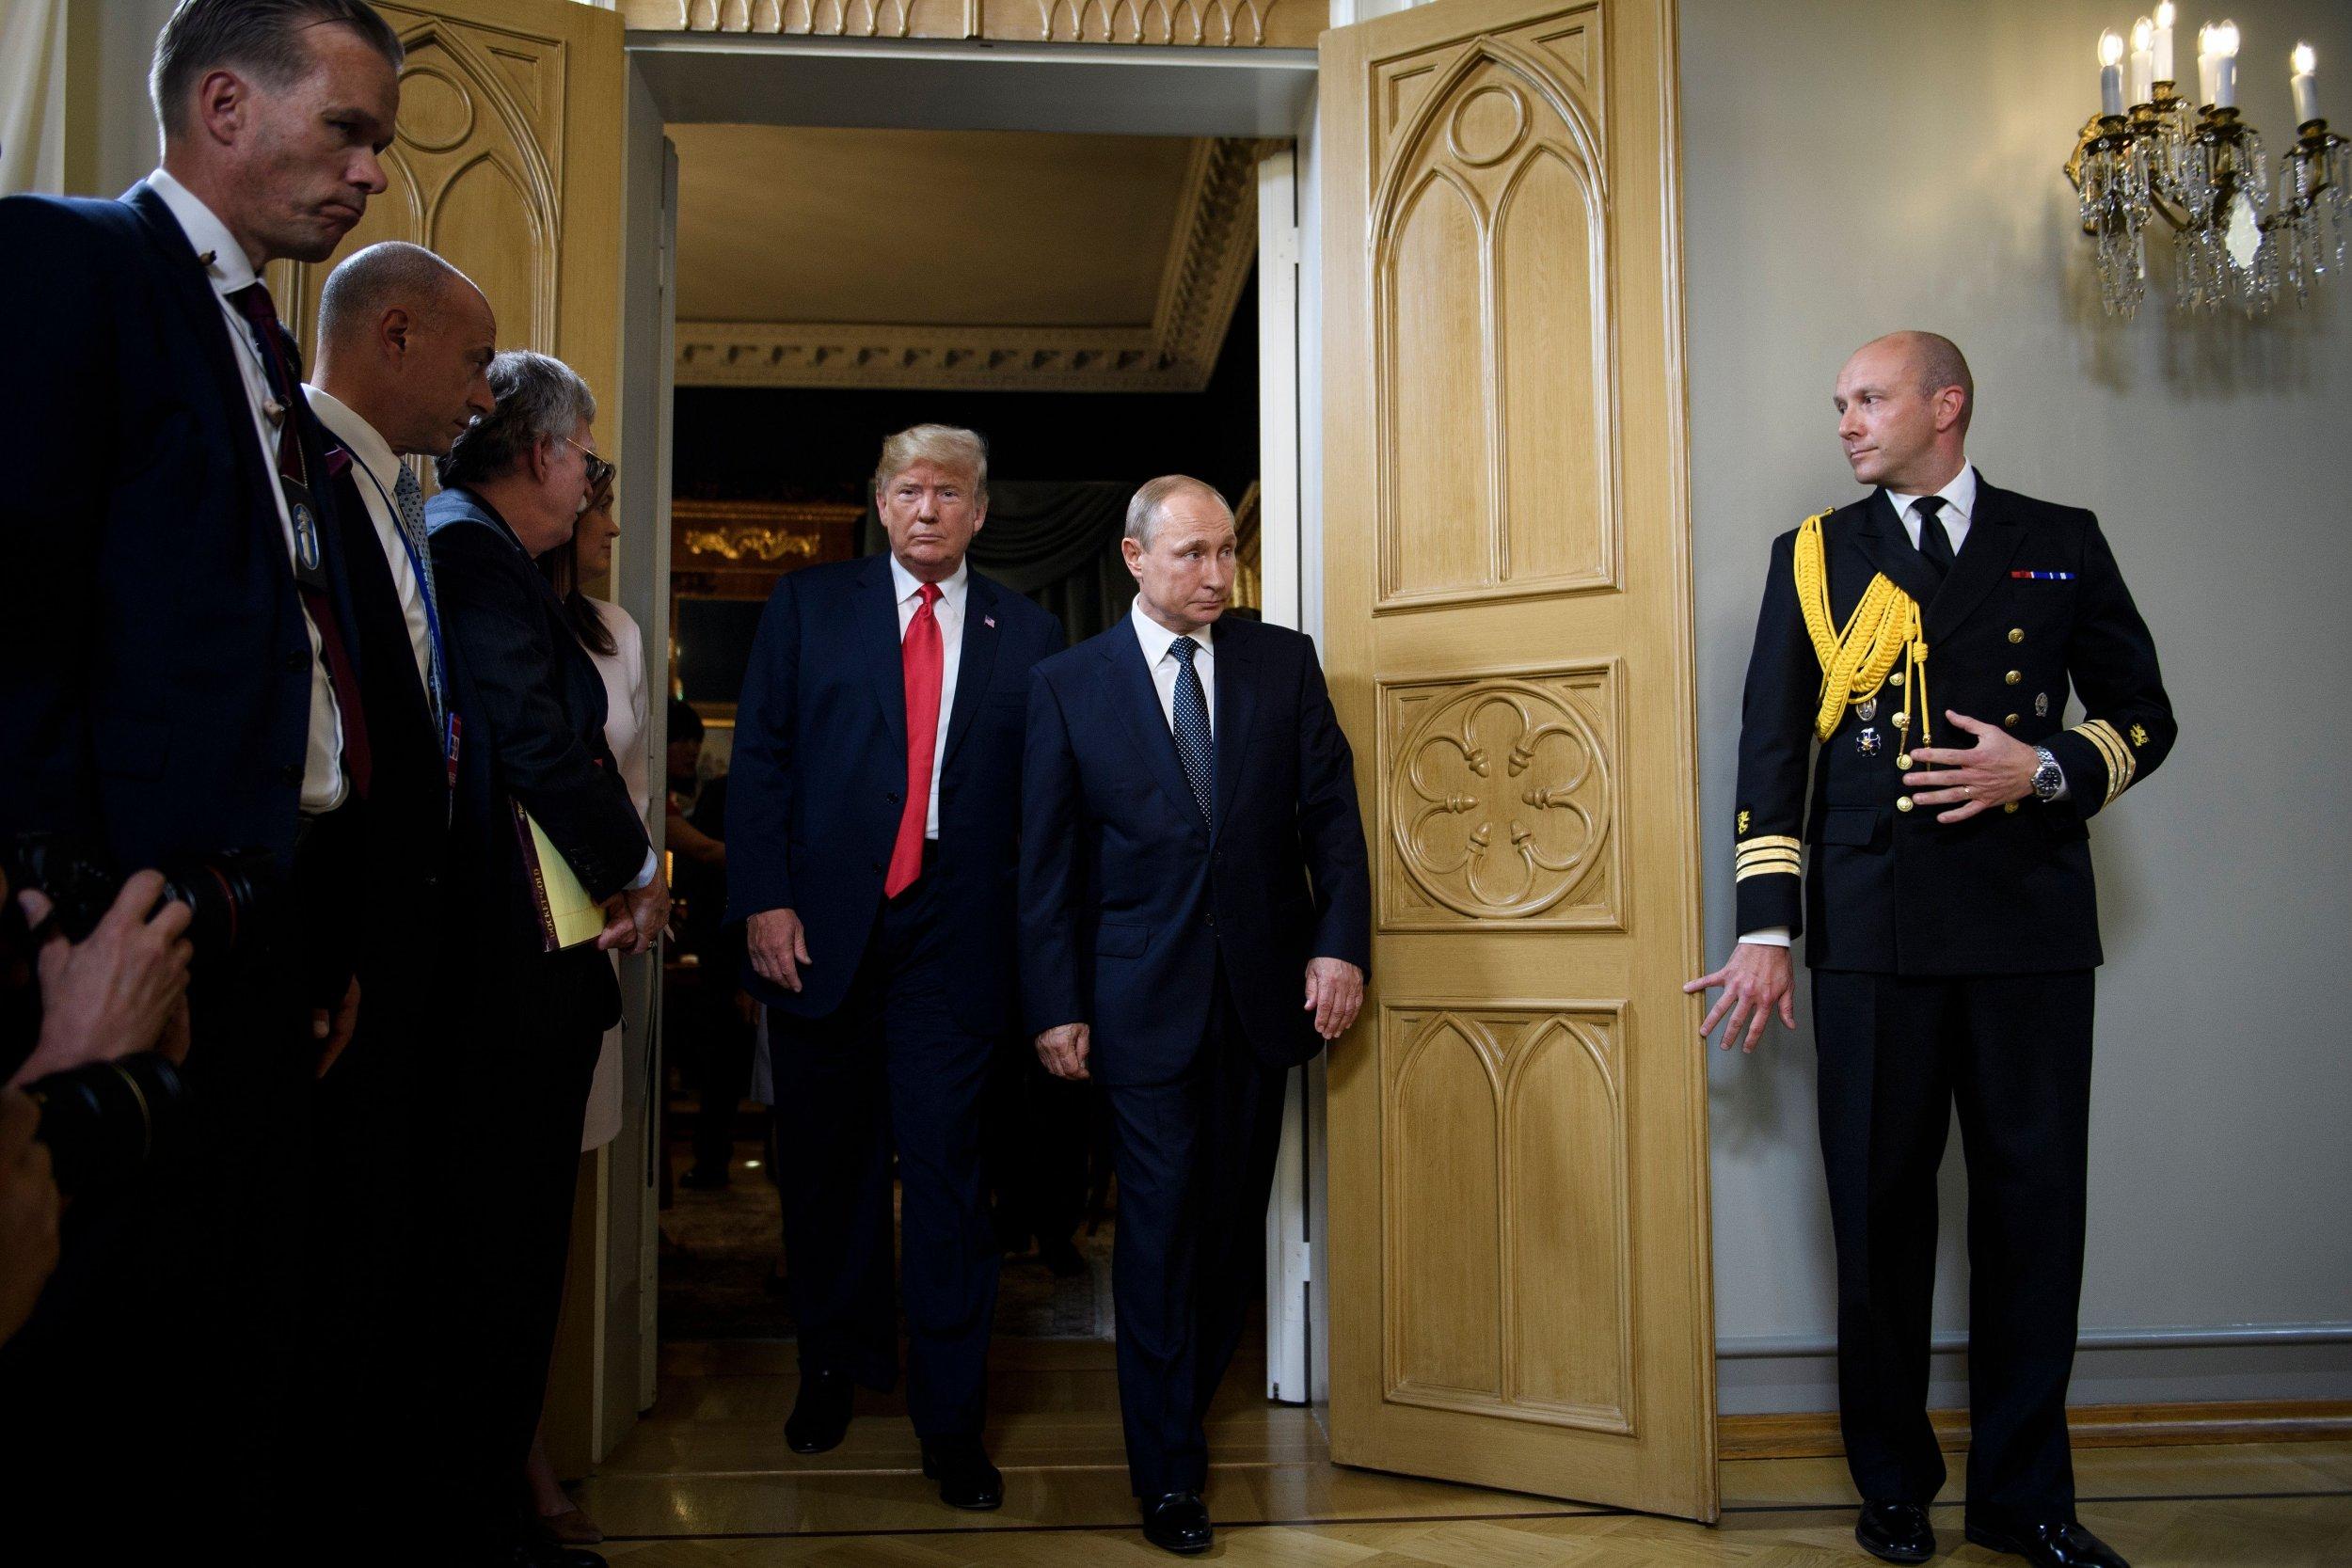 Trump-Russia Dossier Christopher Steele